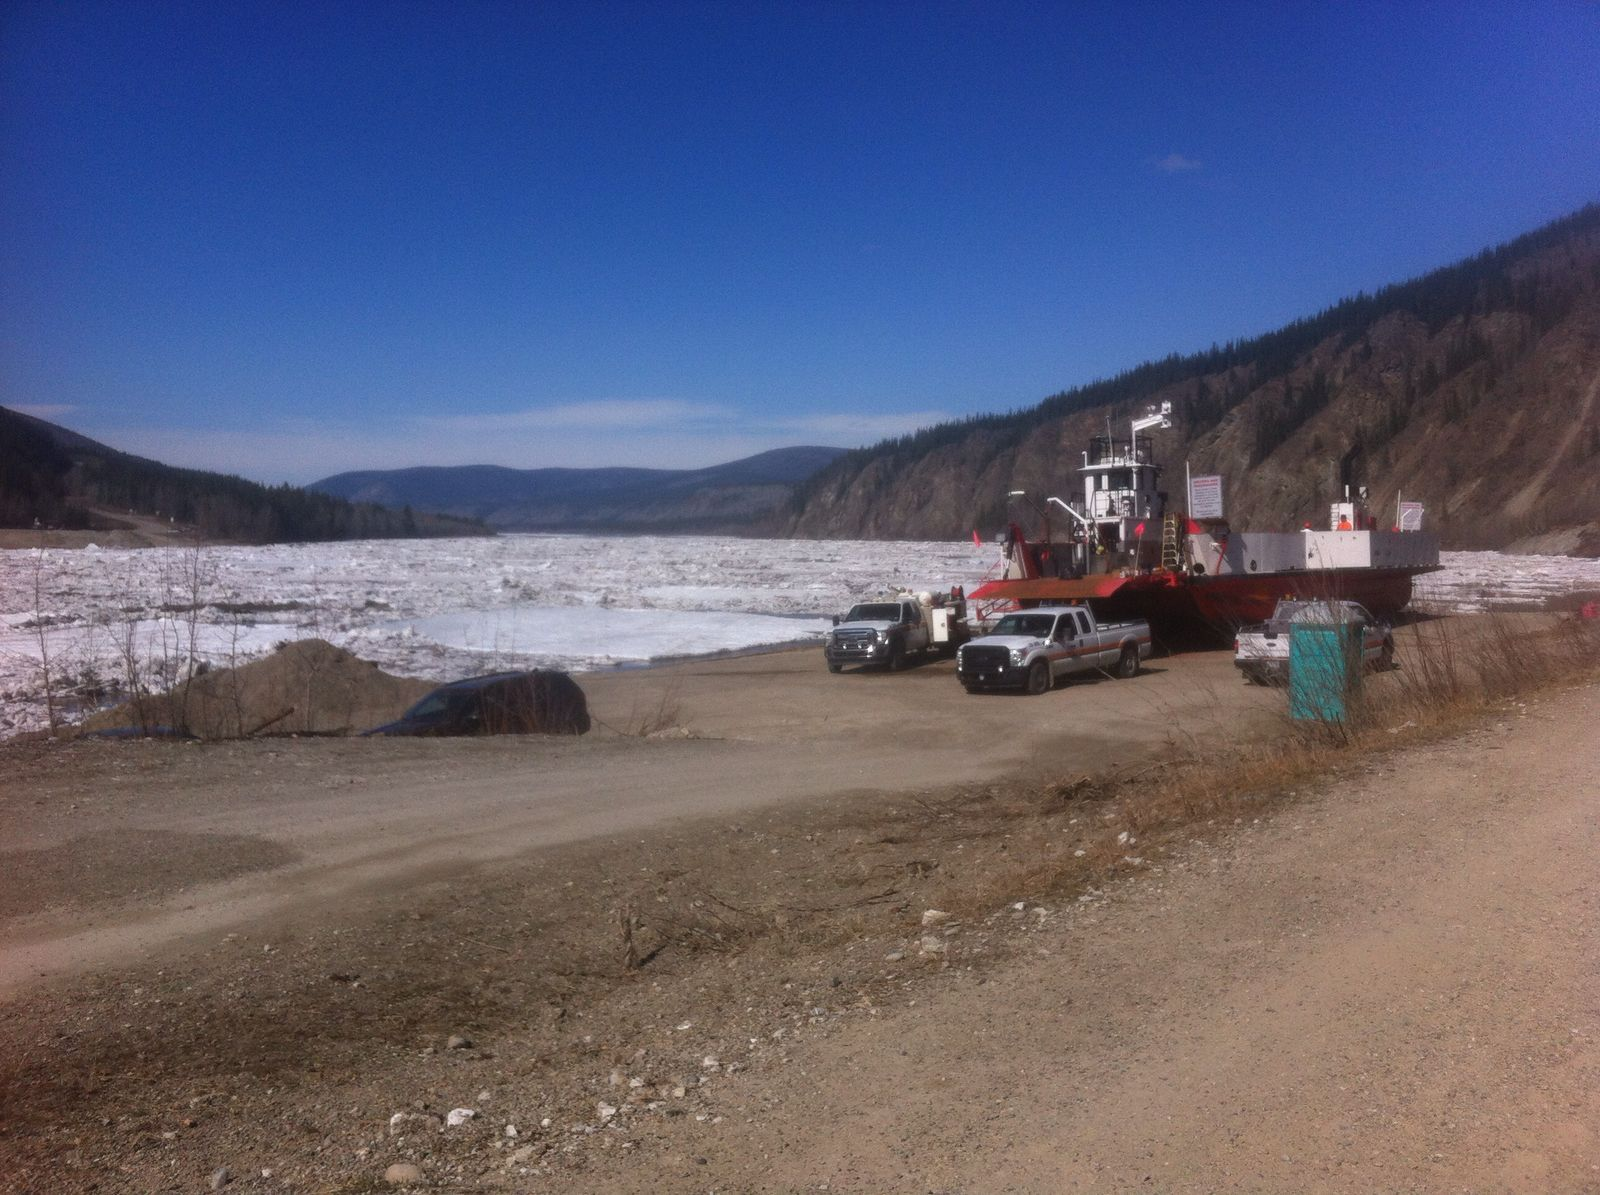 Yukon River: the ice is finally breaking. Miners get ready, season 2018 is starting soon!!!